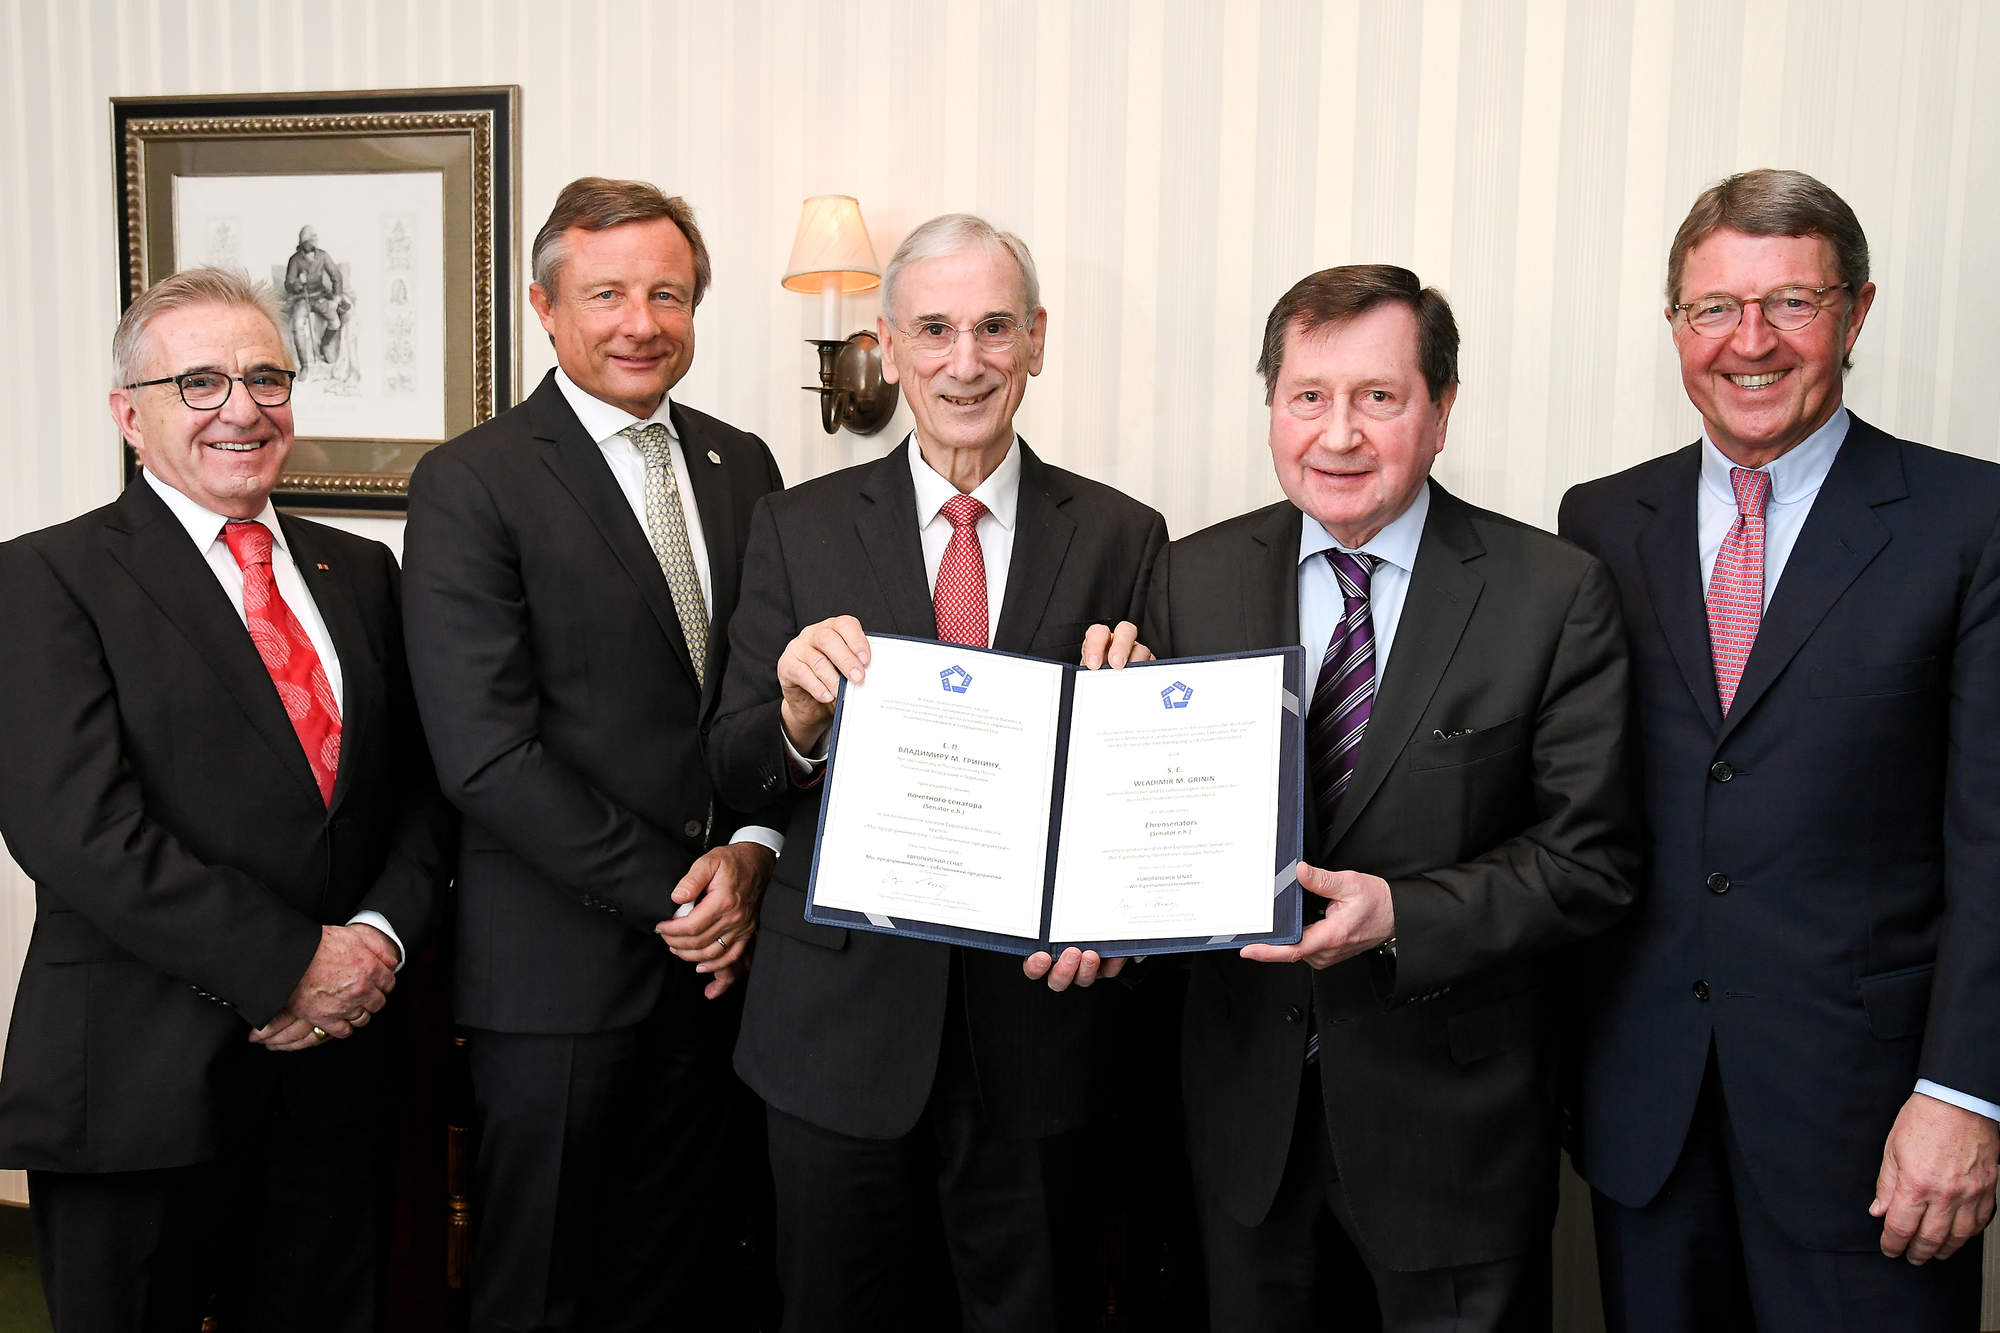 v.l. Werner Küsters, Präsident EWiF e.V. - Wir Eigentümerunternehmer, Dr. Yorck Otto, Jürgen Chrobog, Botschafter Grinin, Dr. Eckhard Cordes